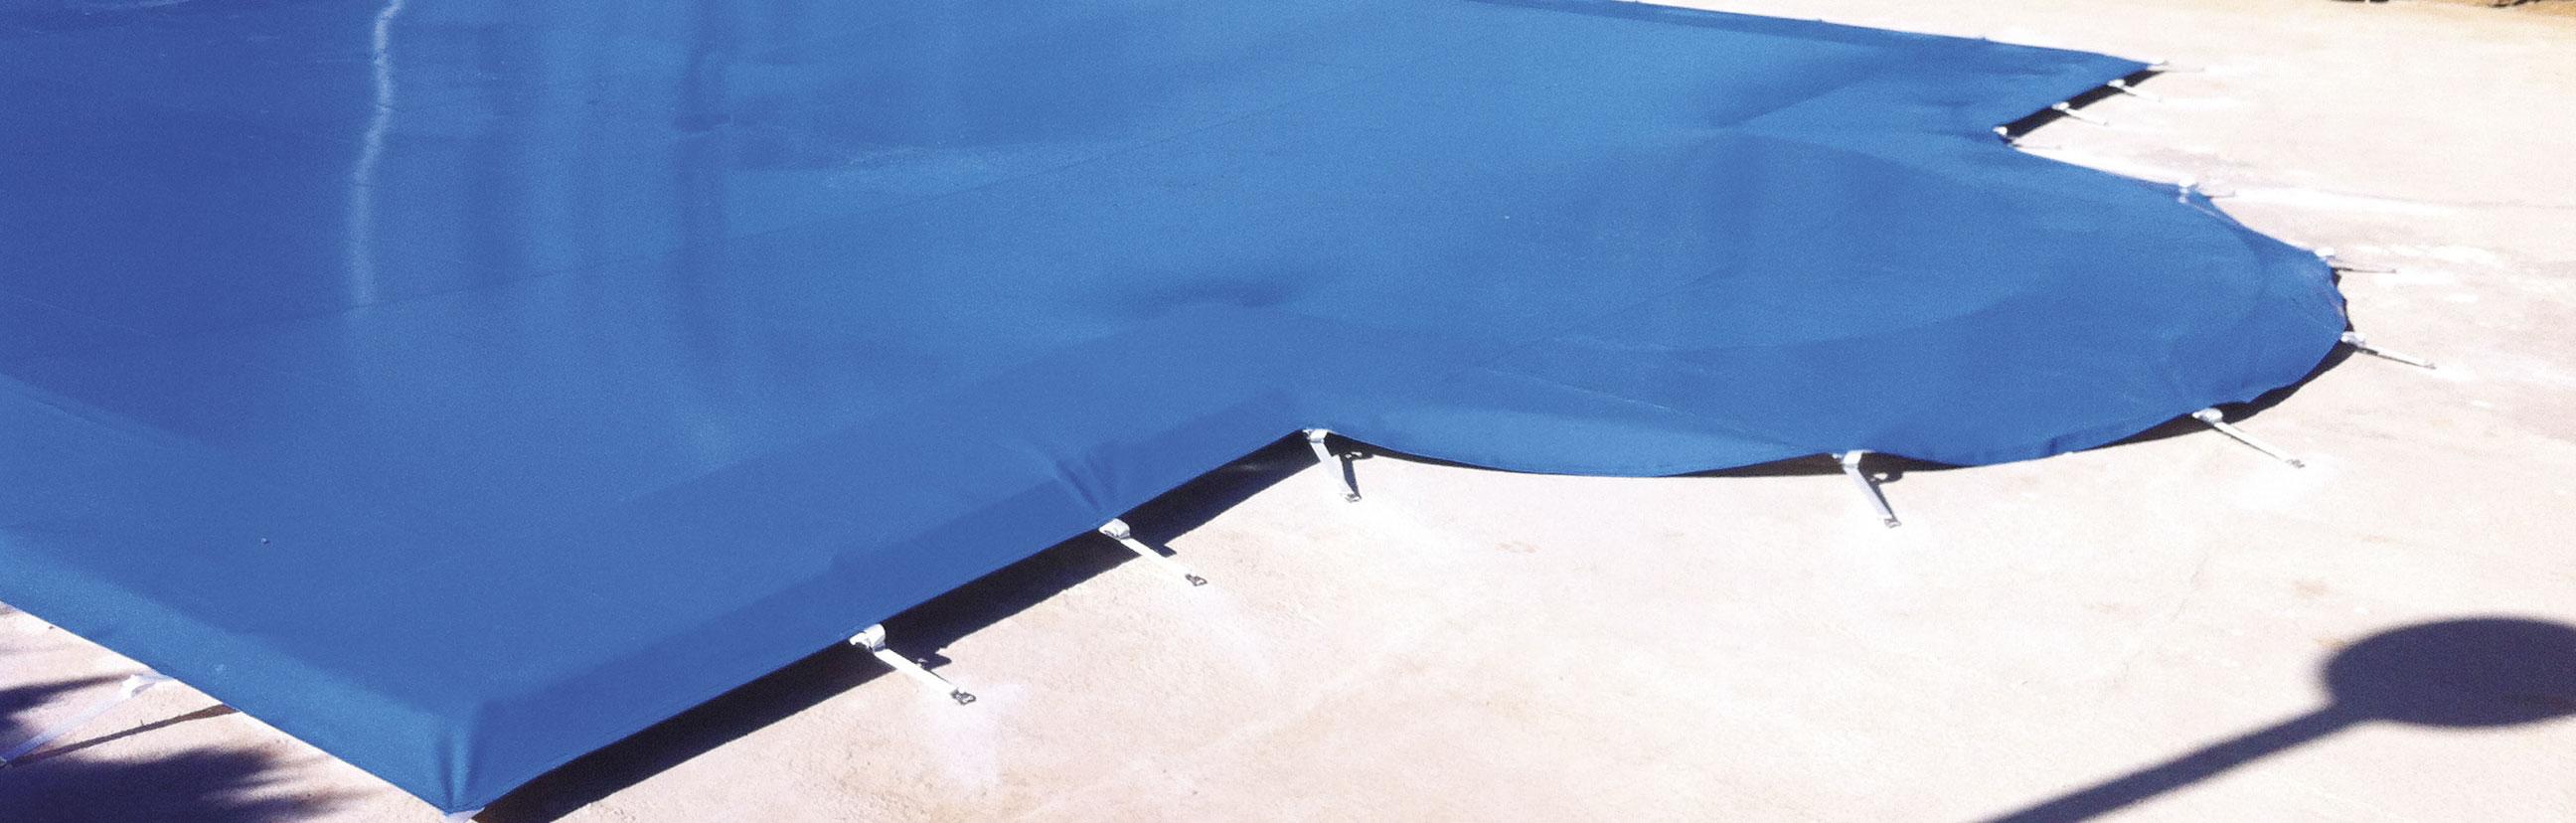 Toldo piscina - Cobertor